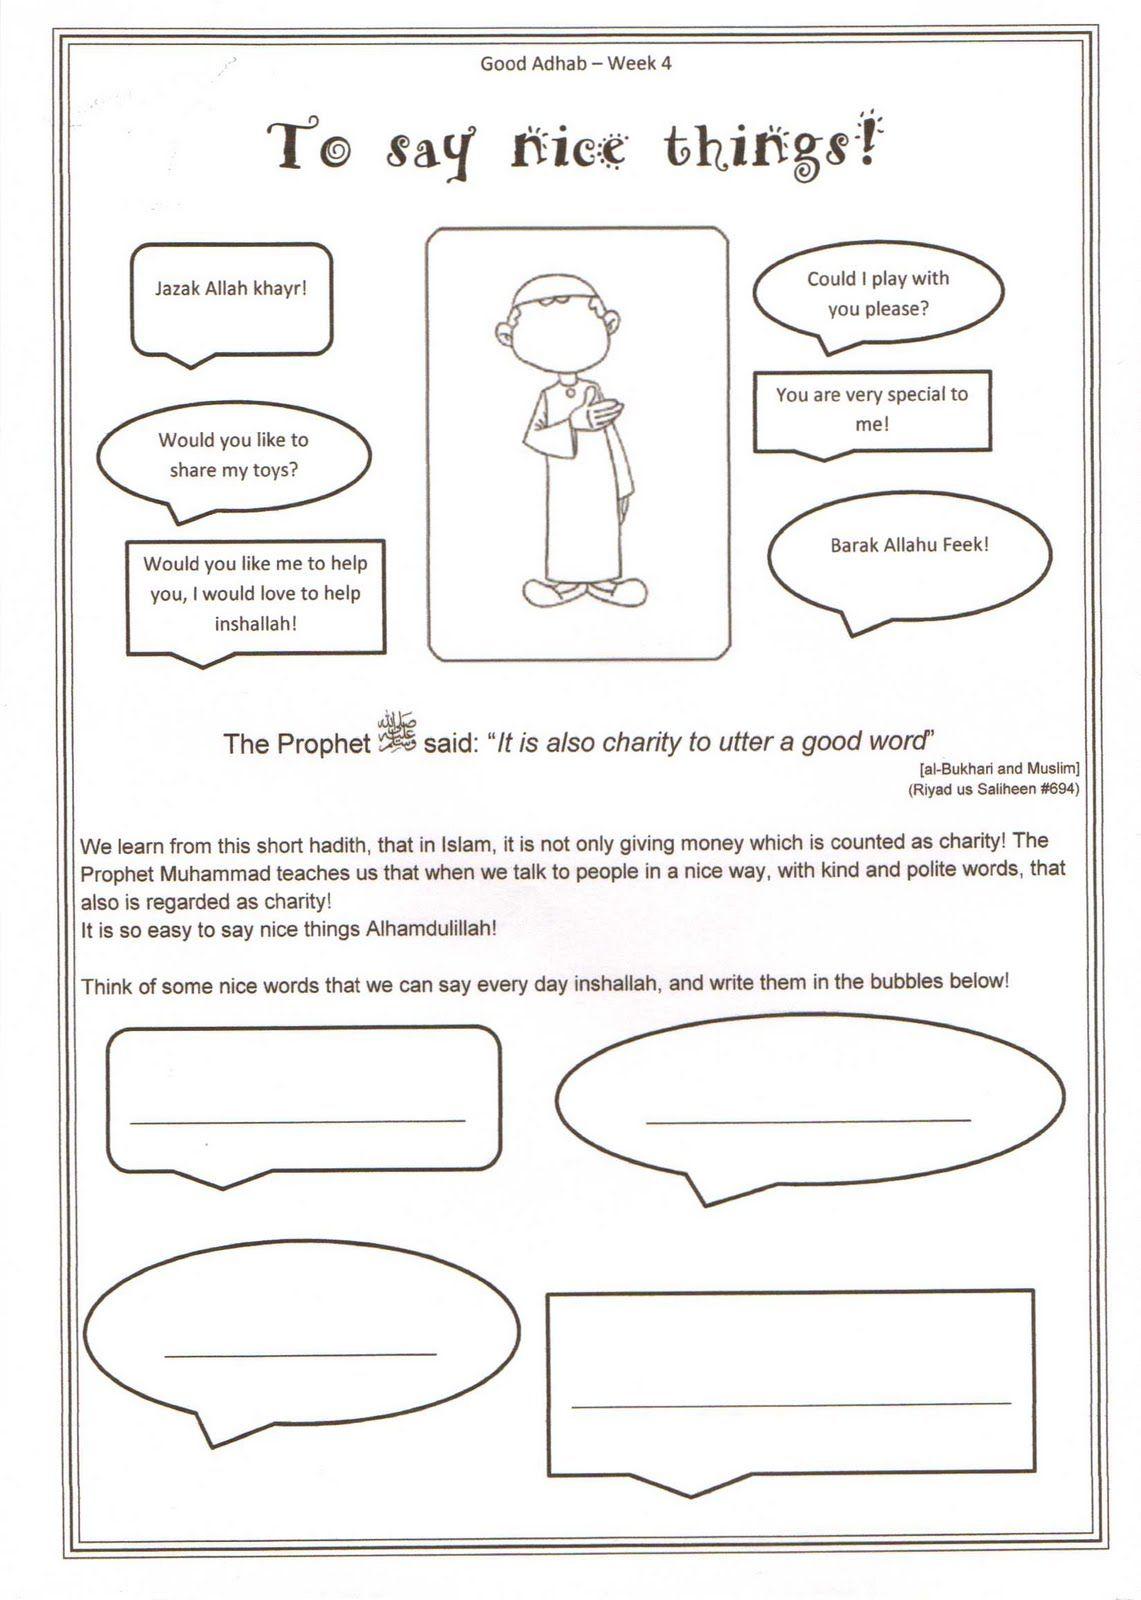 medium resolution of Diary of a Muslim homeschool: Good Adhab - Week 4: saying a good word is  charity!   Islamic studies